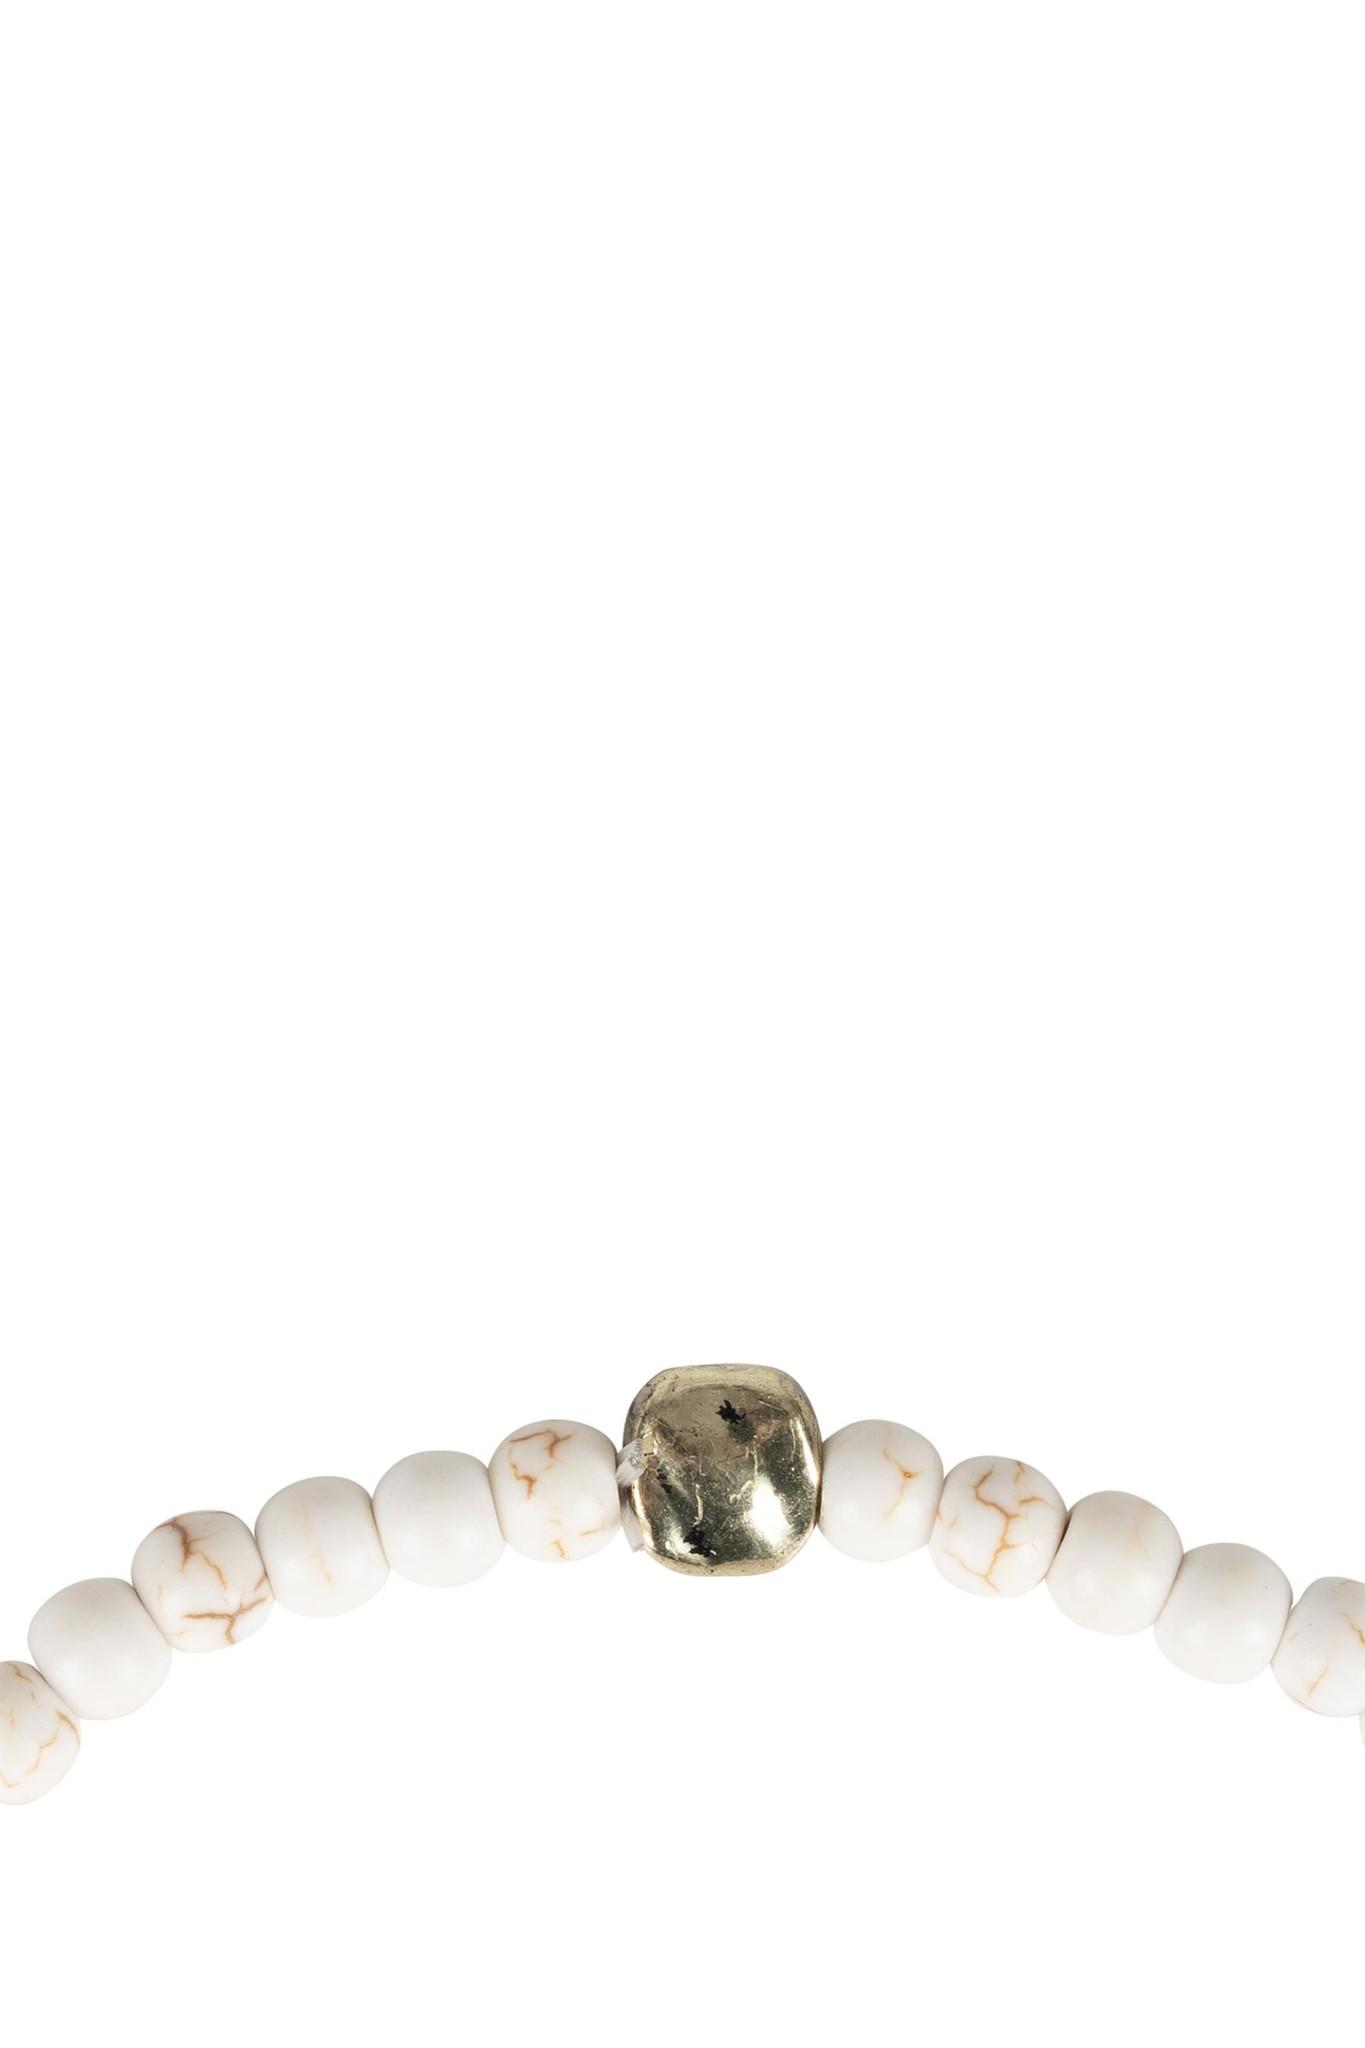 Zusss armband marmerkraal - wit